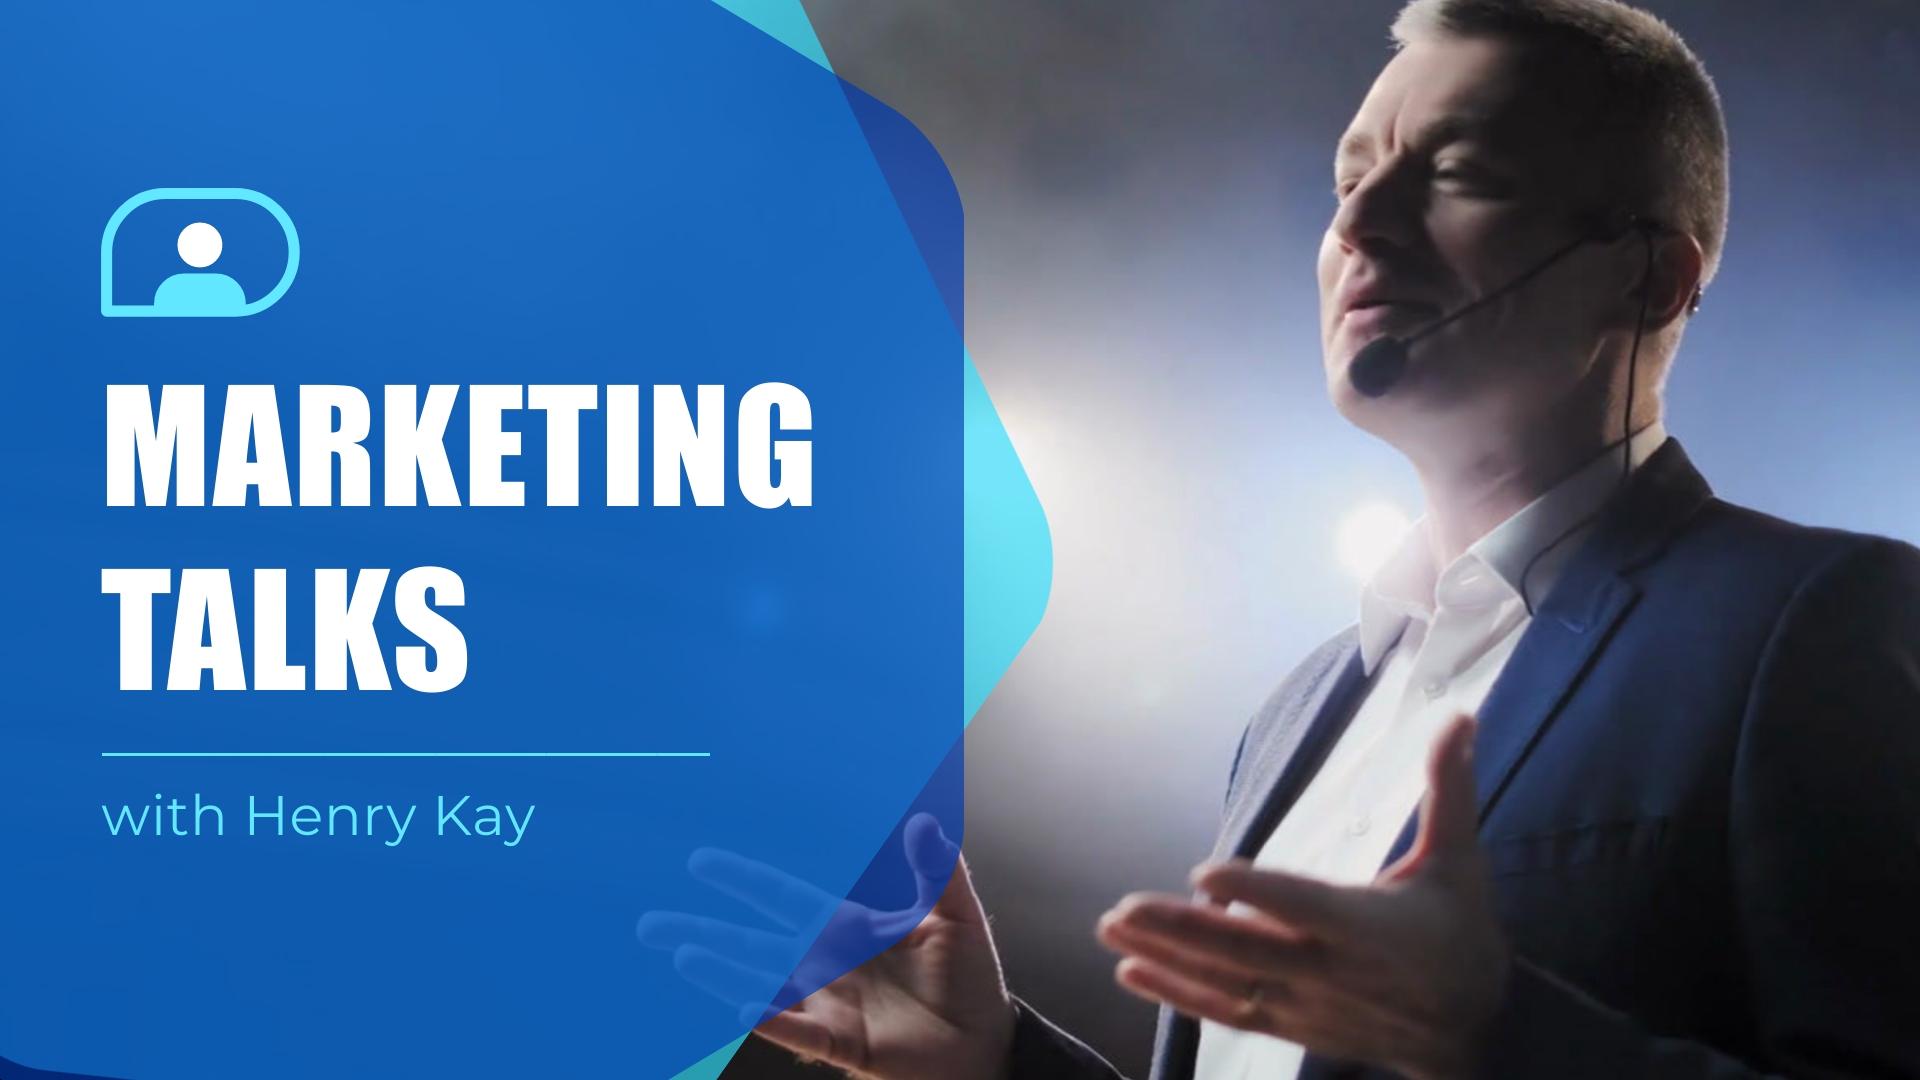 Marketing Talks Intro - Video Template